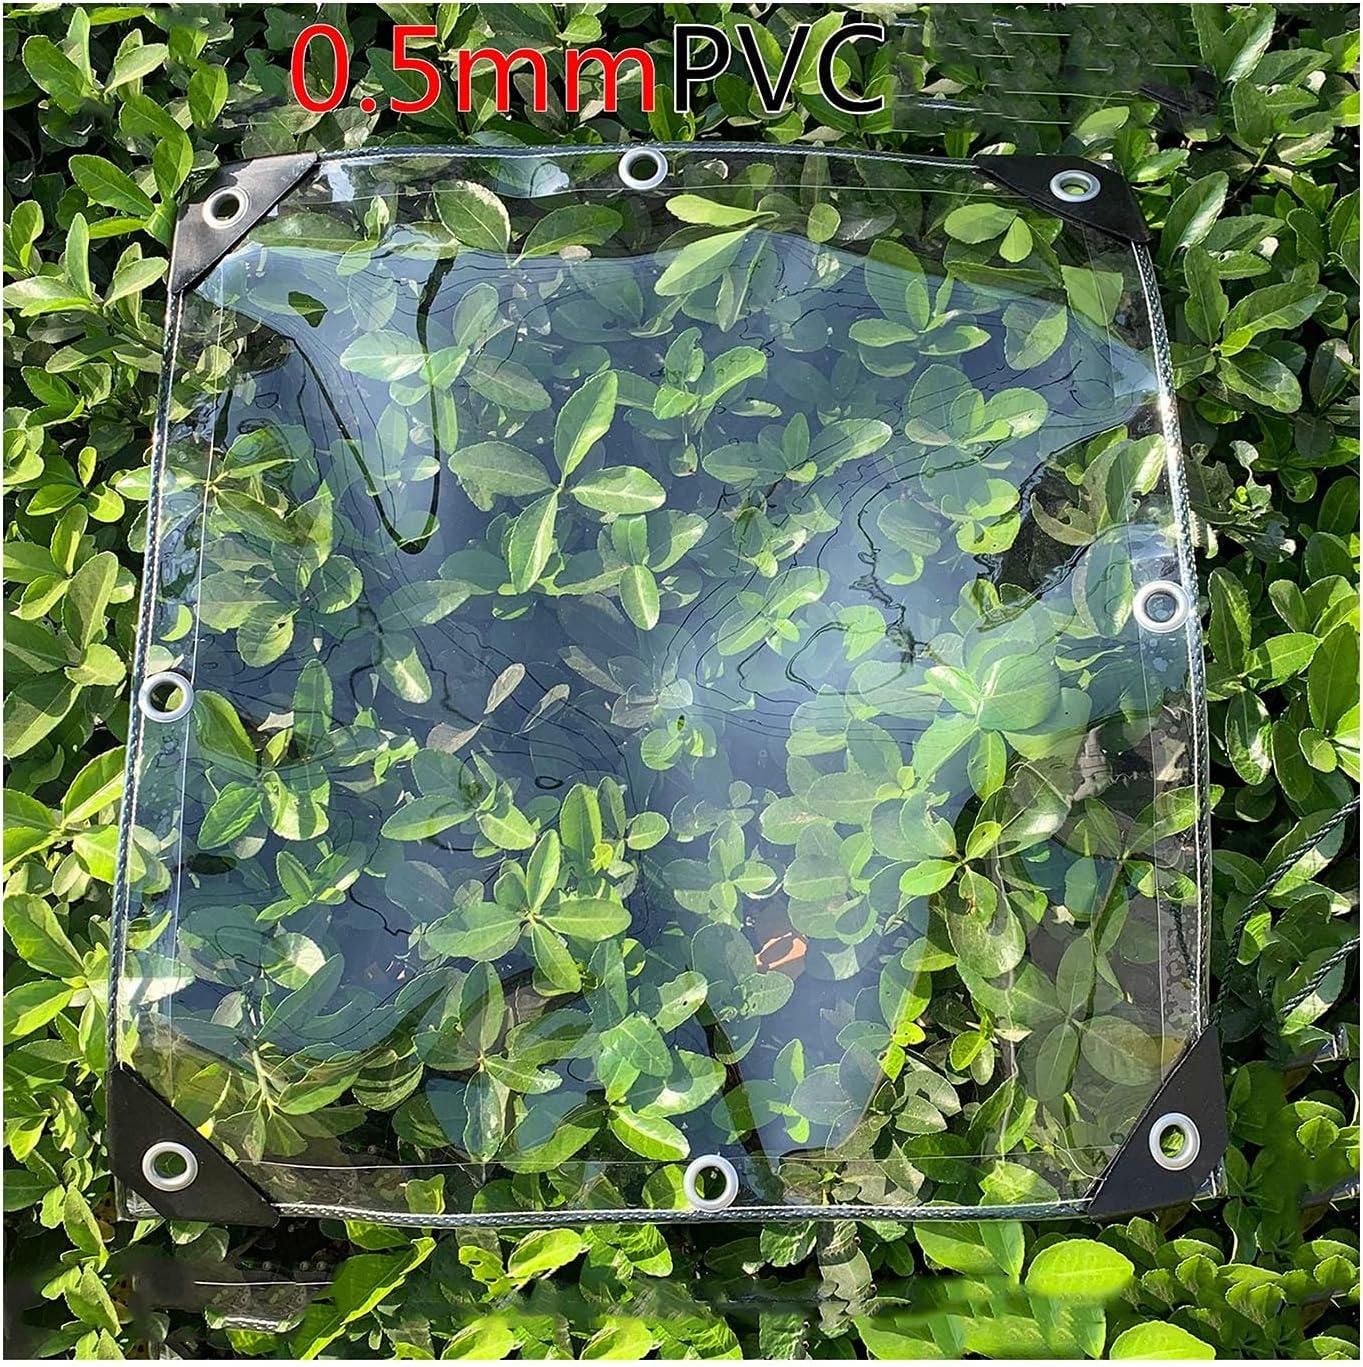 Tarp LJIANW Transparent Tarpaulin Cover 2021 spring and summer new Shelter He Save money Balcony Rain